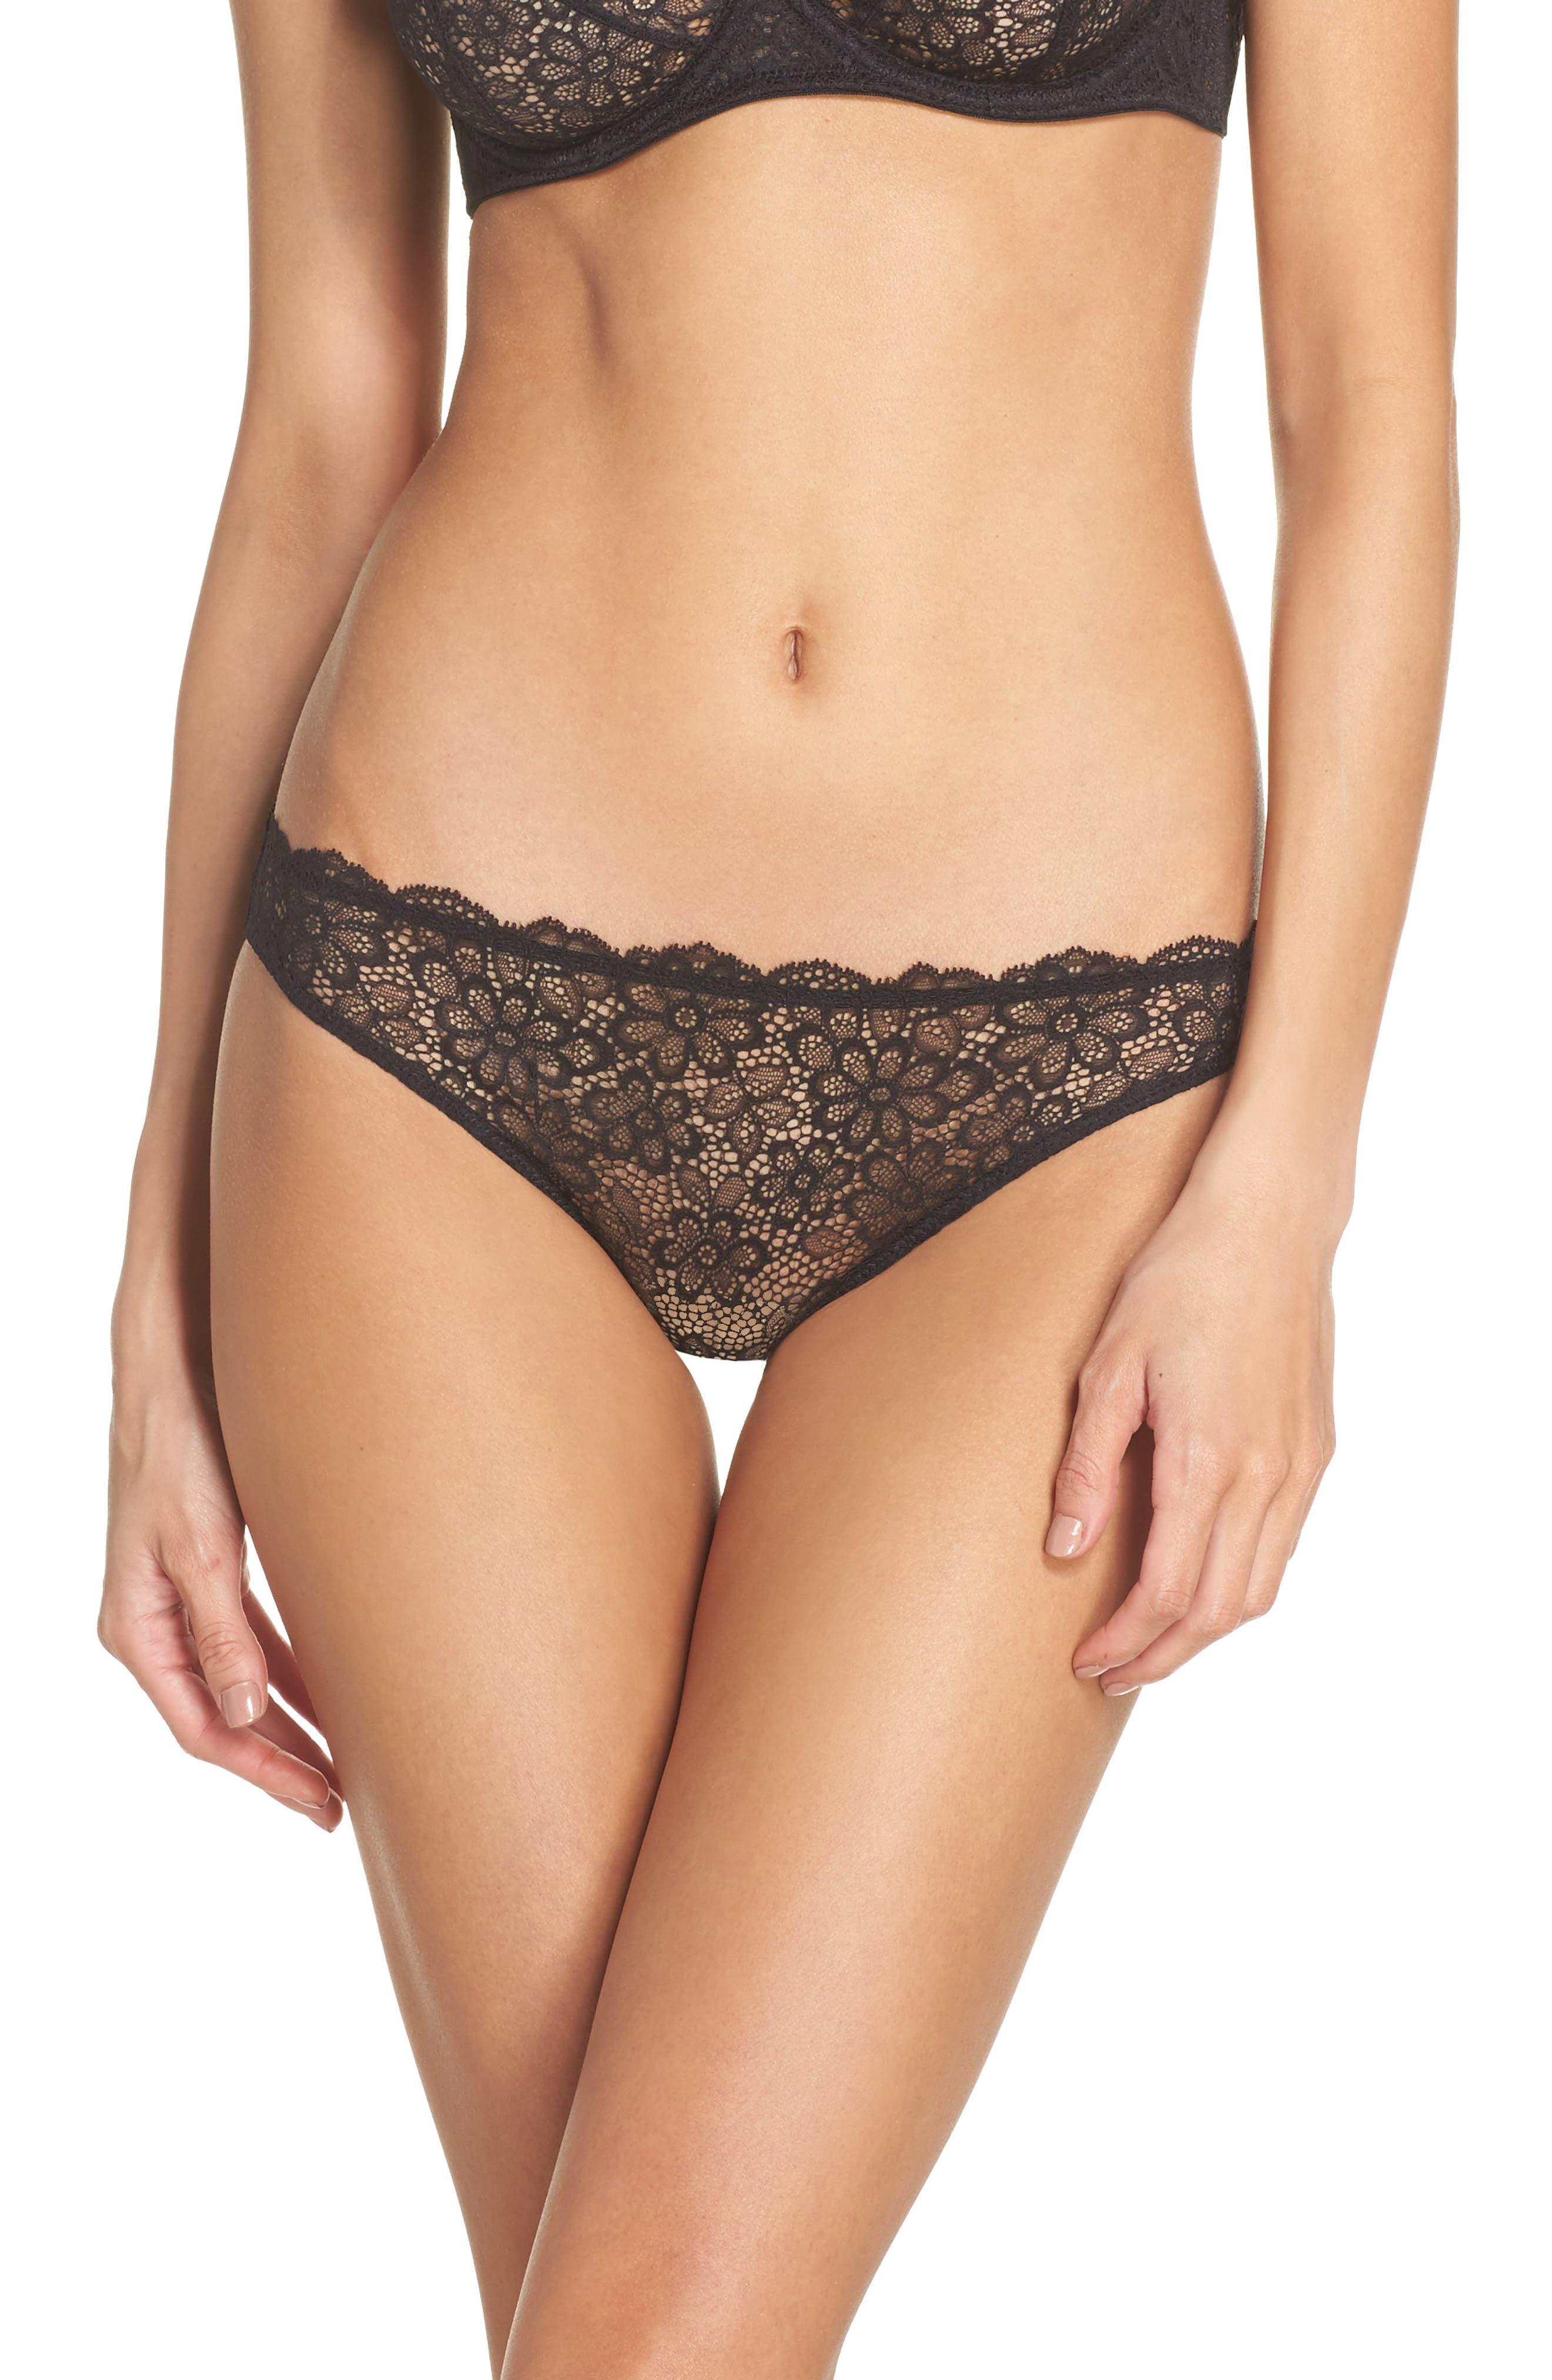 Daisy Lace Panties,                         Main,                         color, Black